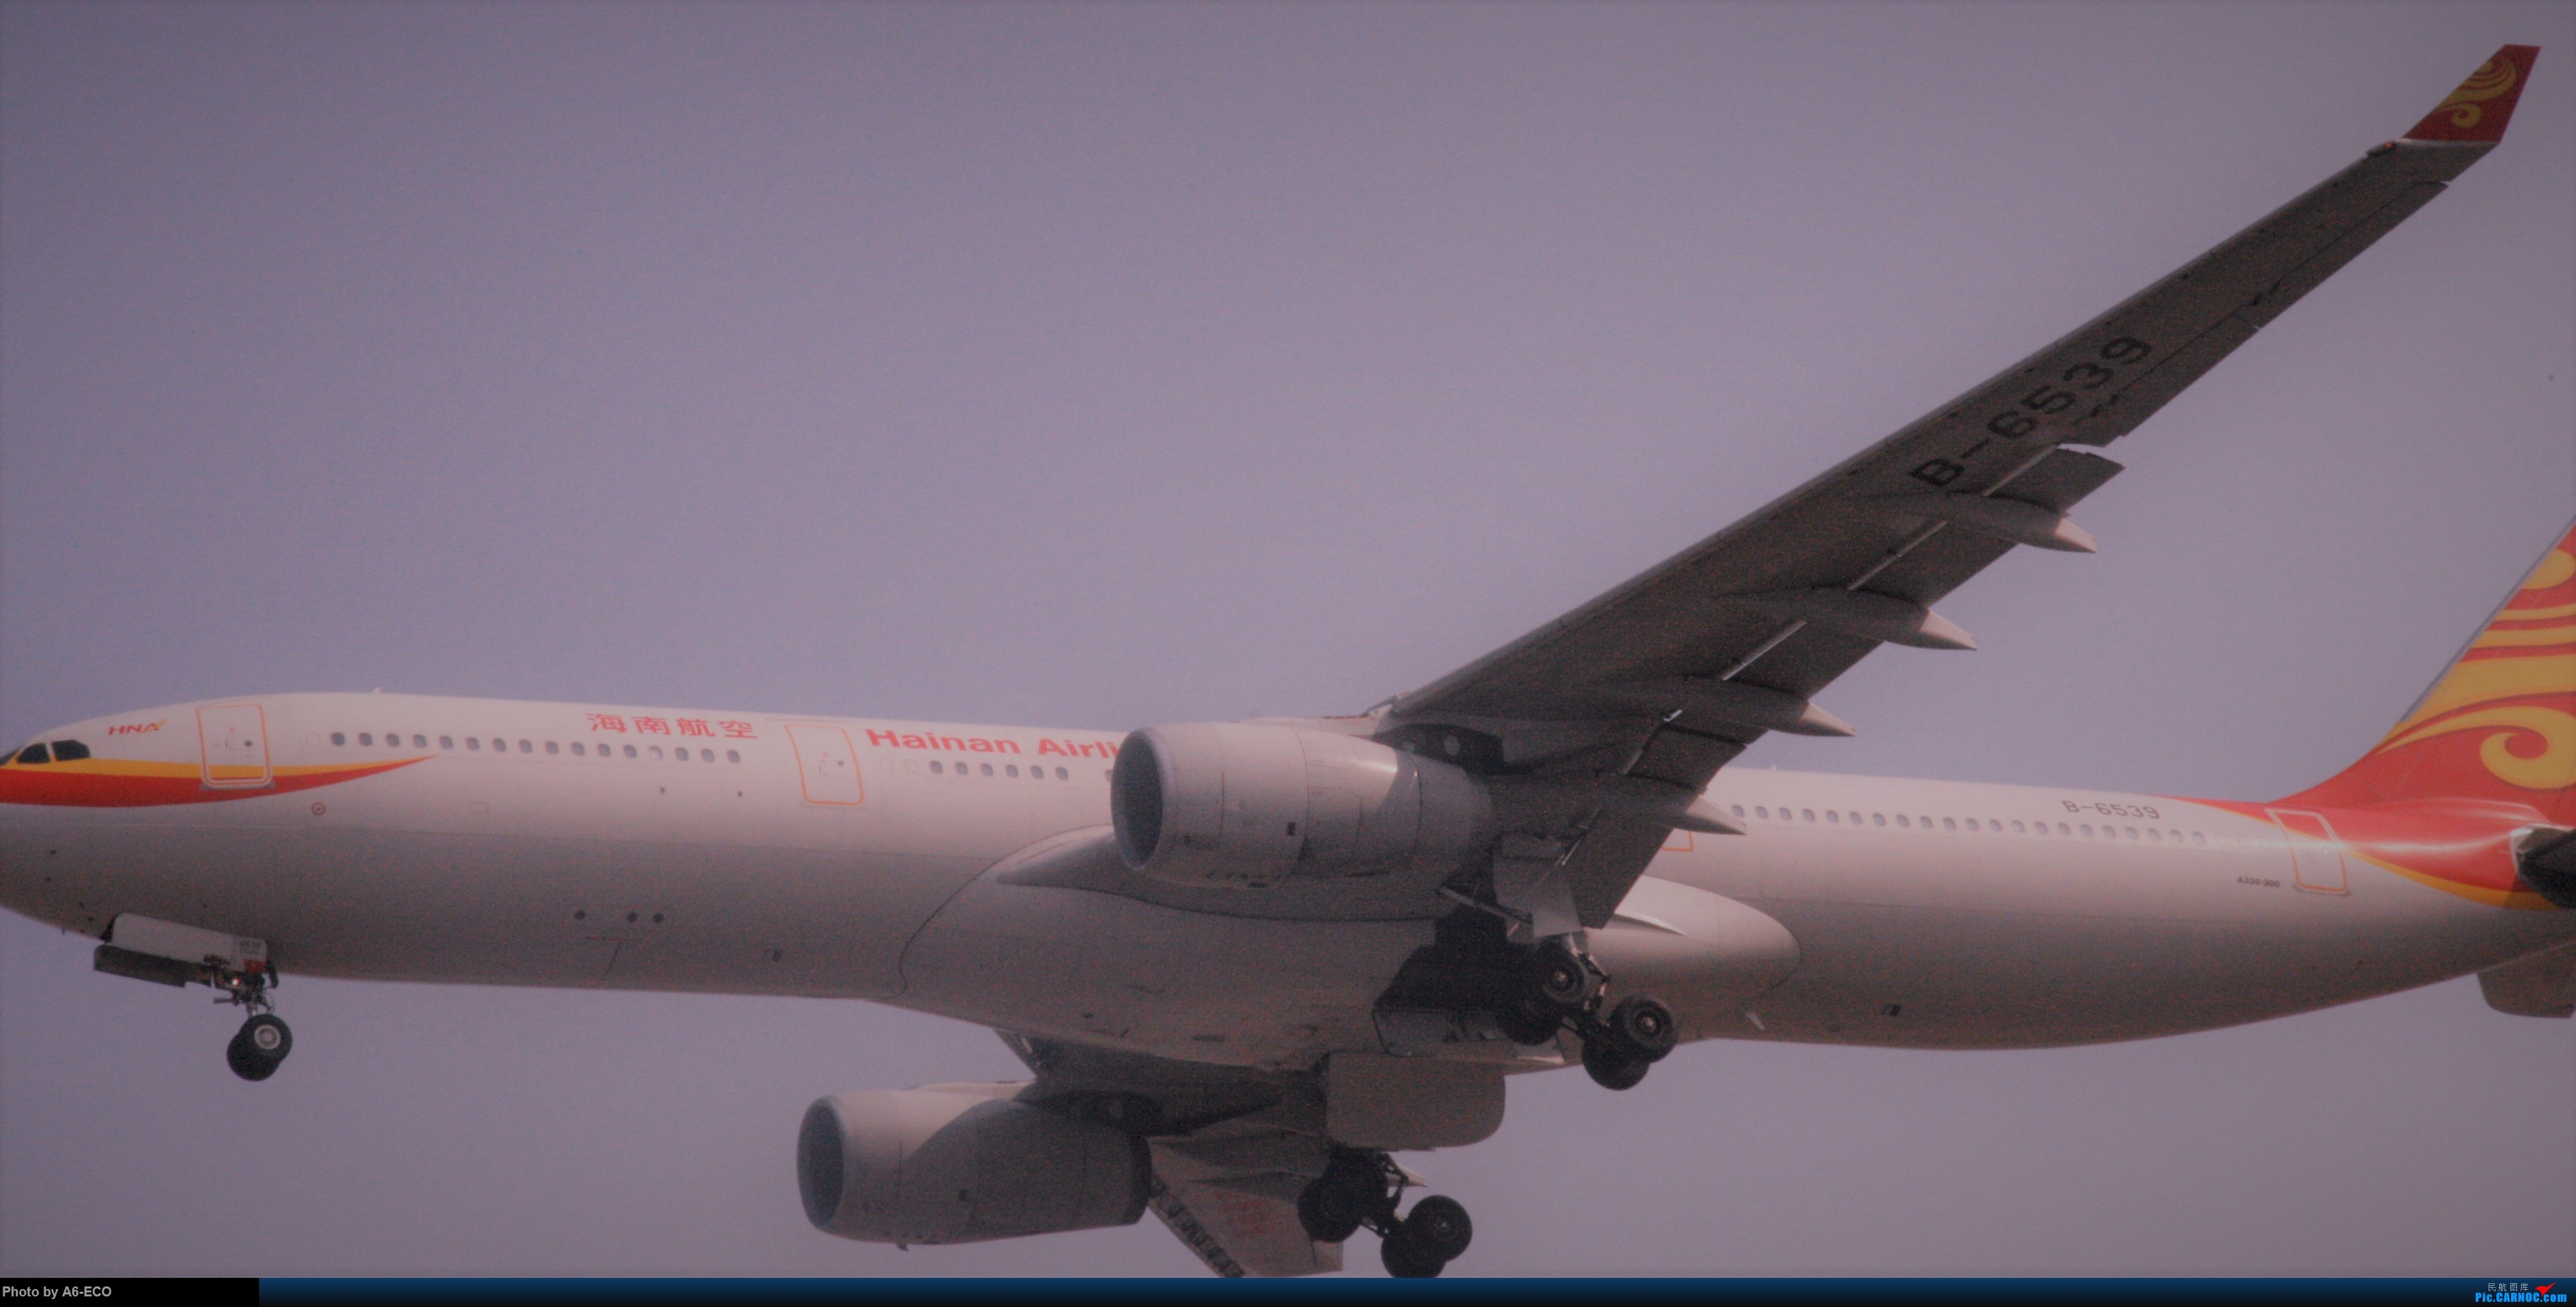 Re:[原创]今天运气极好,云南孔雀,B-1070,2个菜航邮戳,泡菜航彩绘,东航邮戳...... AIRBUS A330-300 B-6539 中国北京首都国际机场